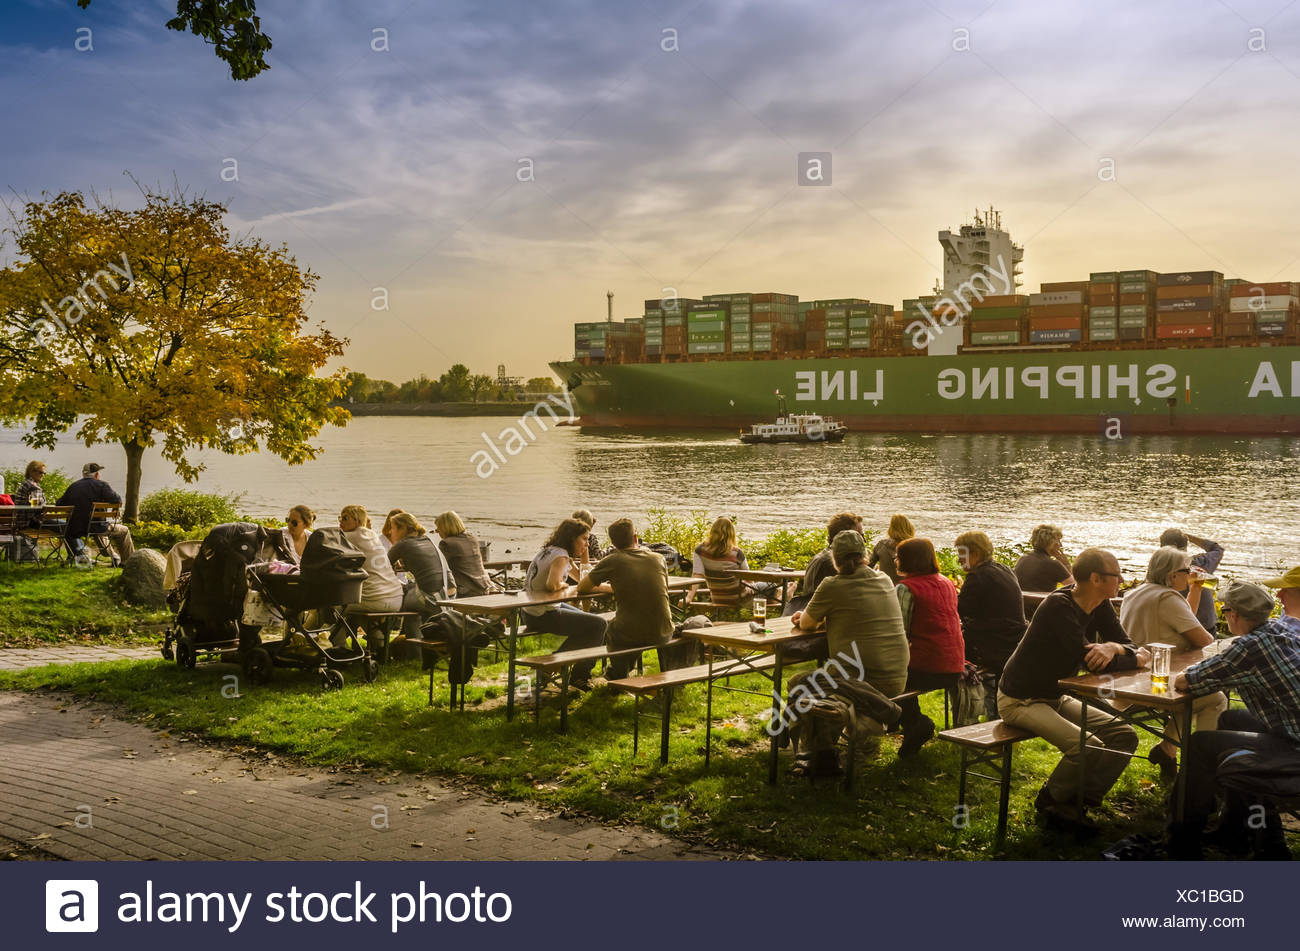 Germany Hamburg Harbour Elbe Elbe Shore Container Ship Outdoor Cafe Beer Garden Guests Stock Photo Alamy